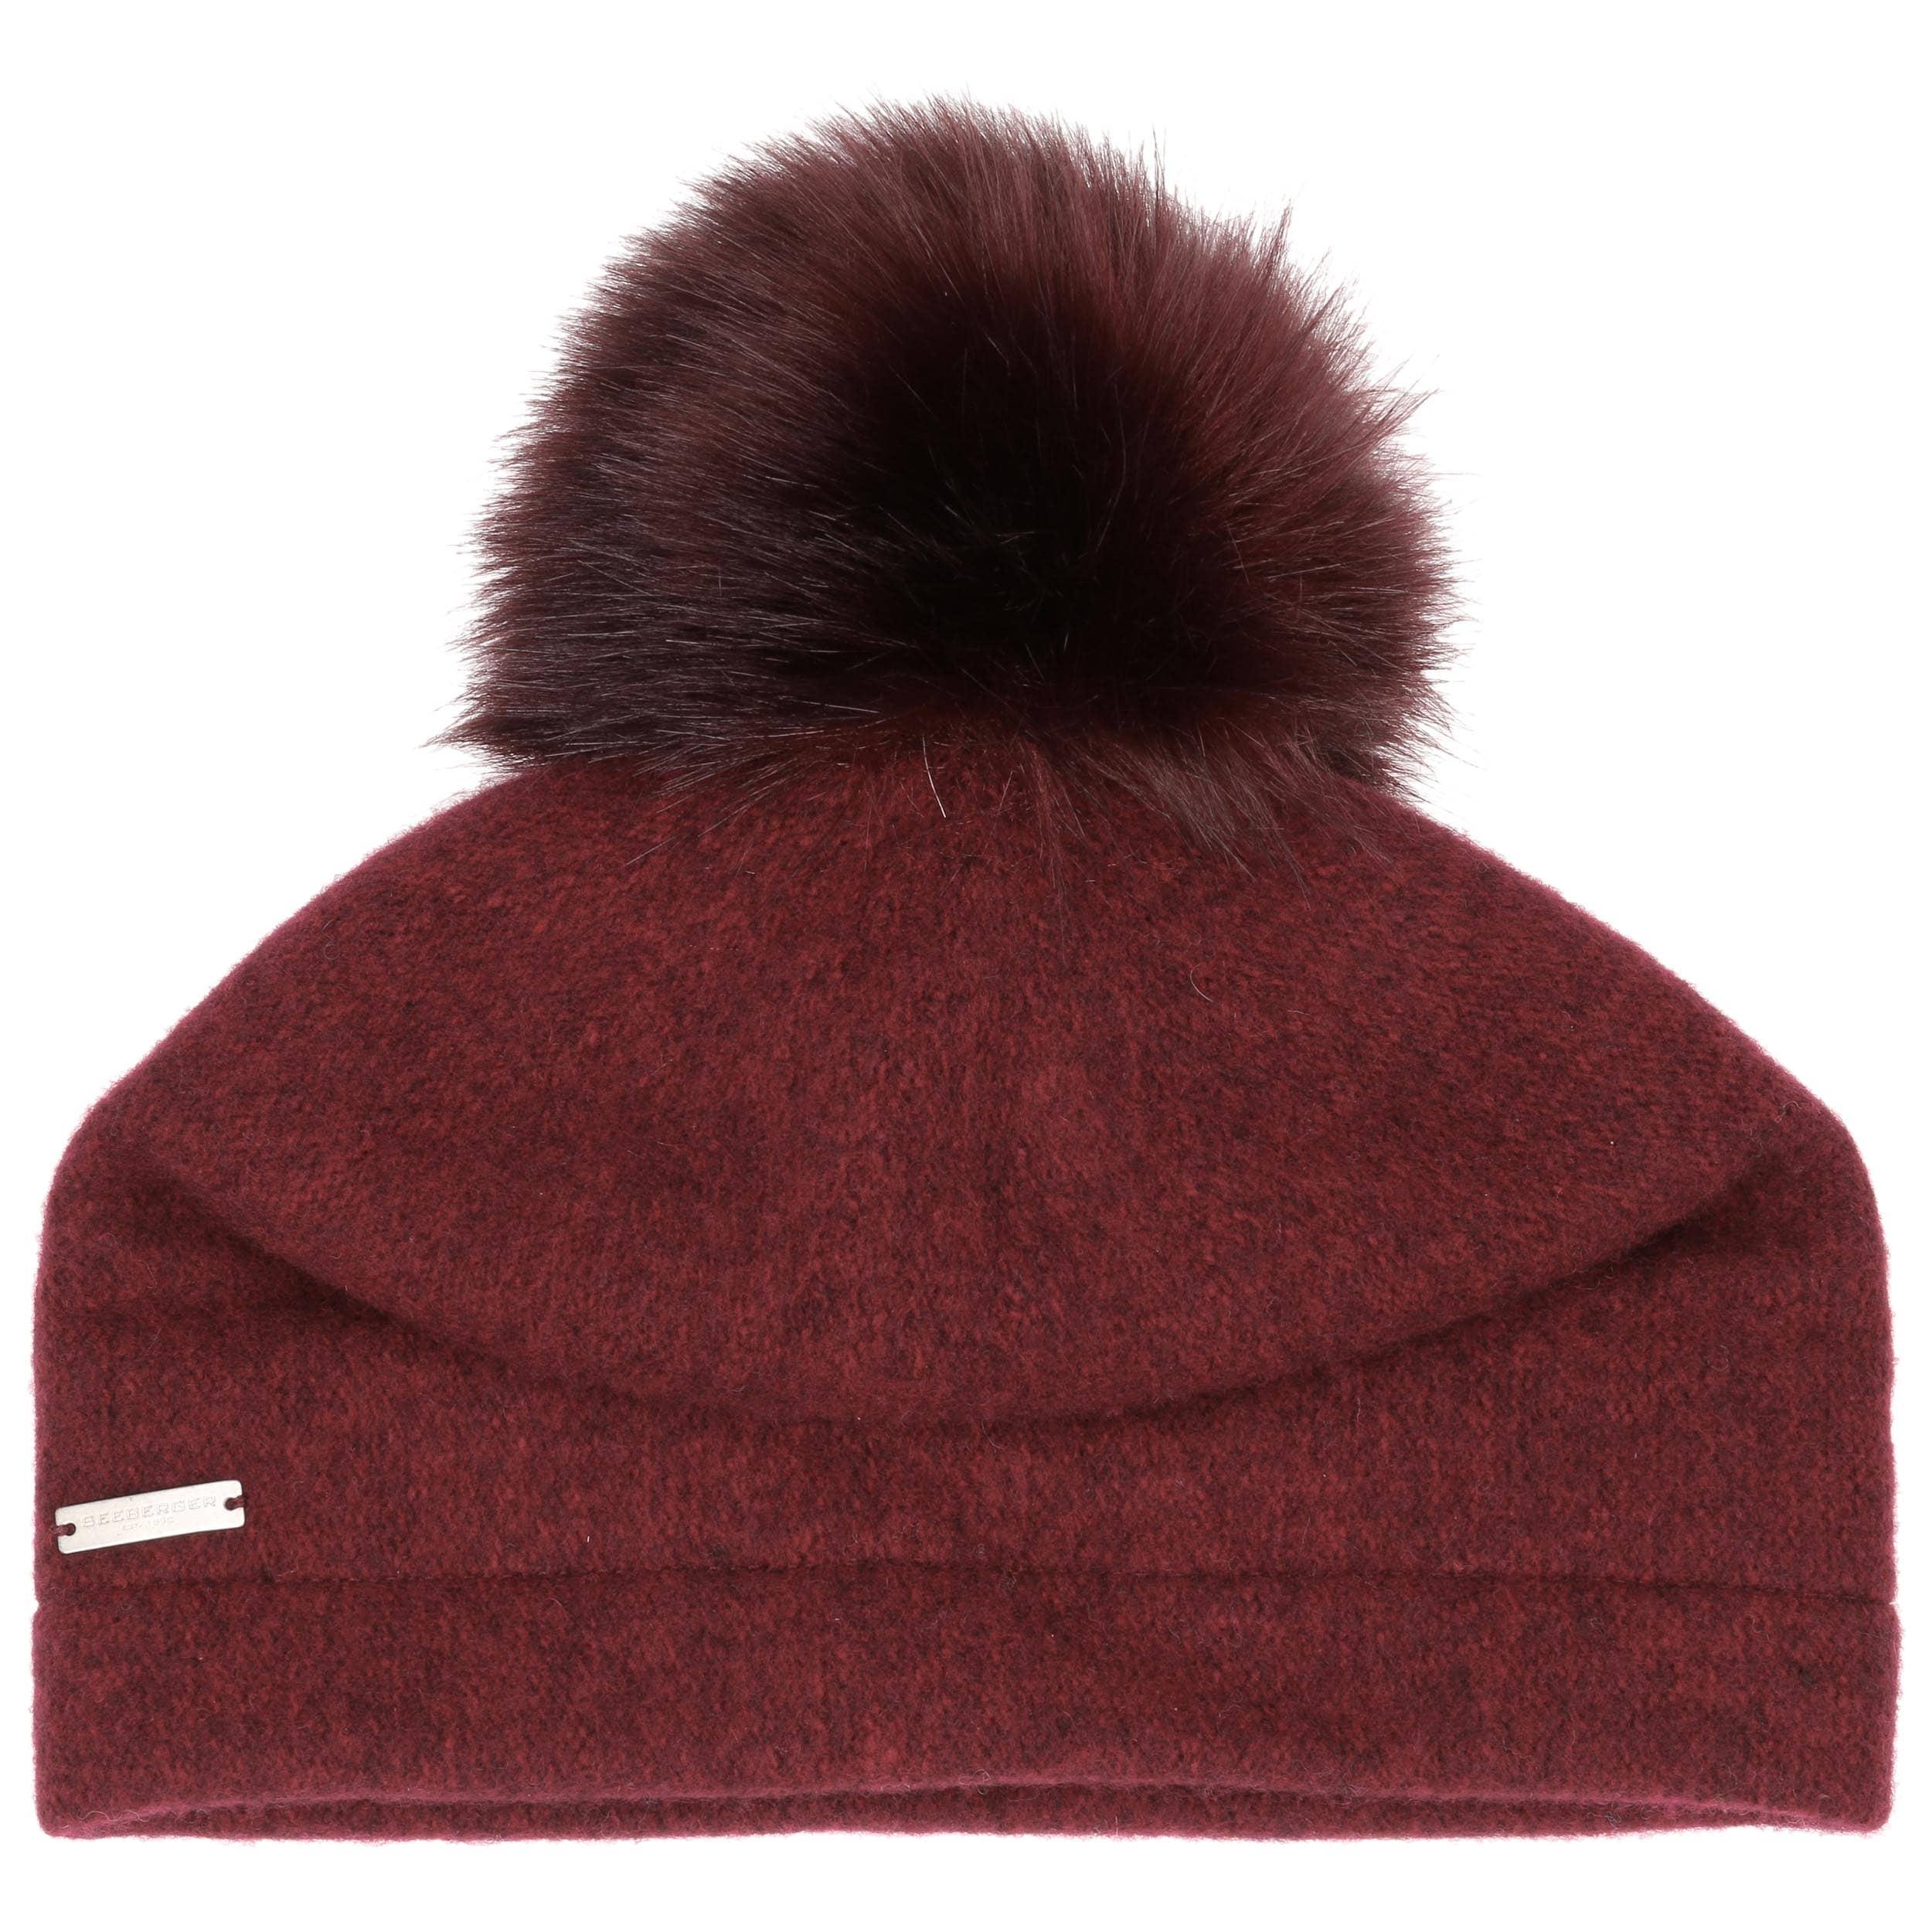 b0bf33d42ea ... Tamisa Milled Wool Hat by Seeberger - bordeaux 1 ...